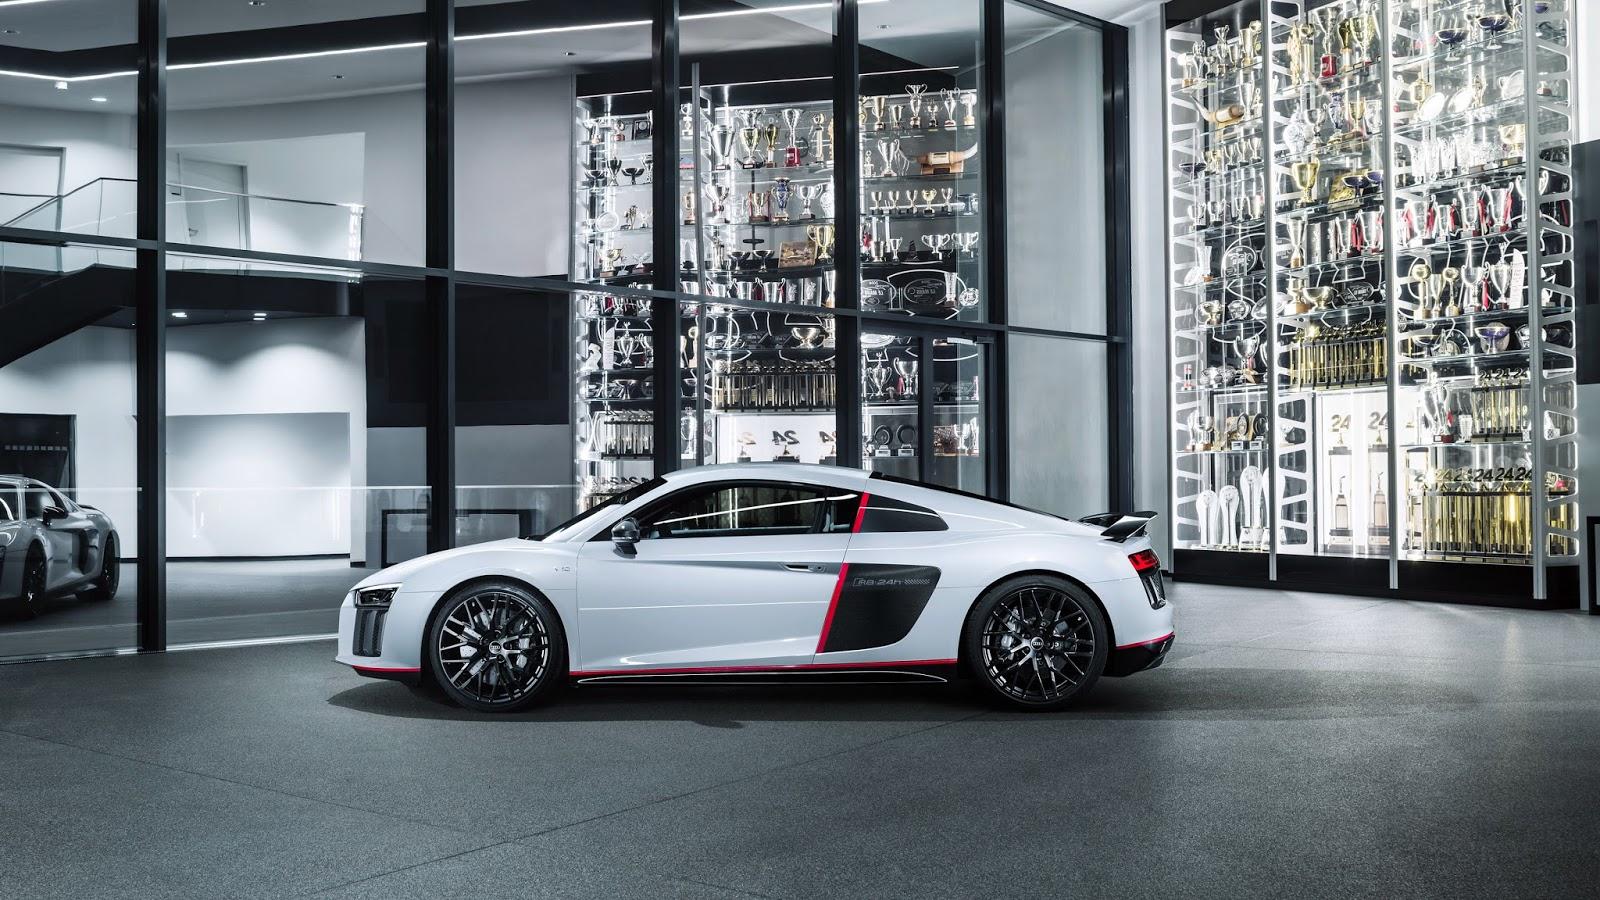 Audi R Regula tuning wallpaper HD Desktop Wallpaper